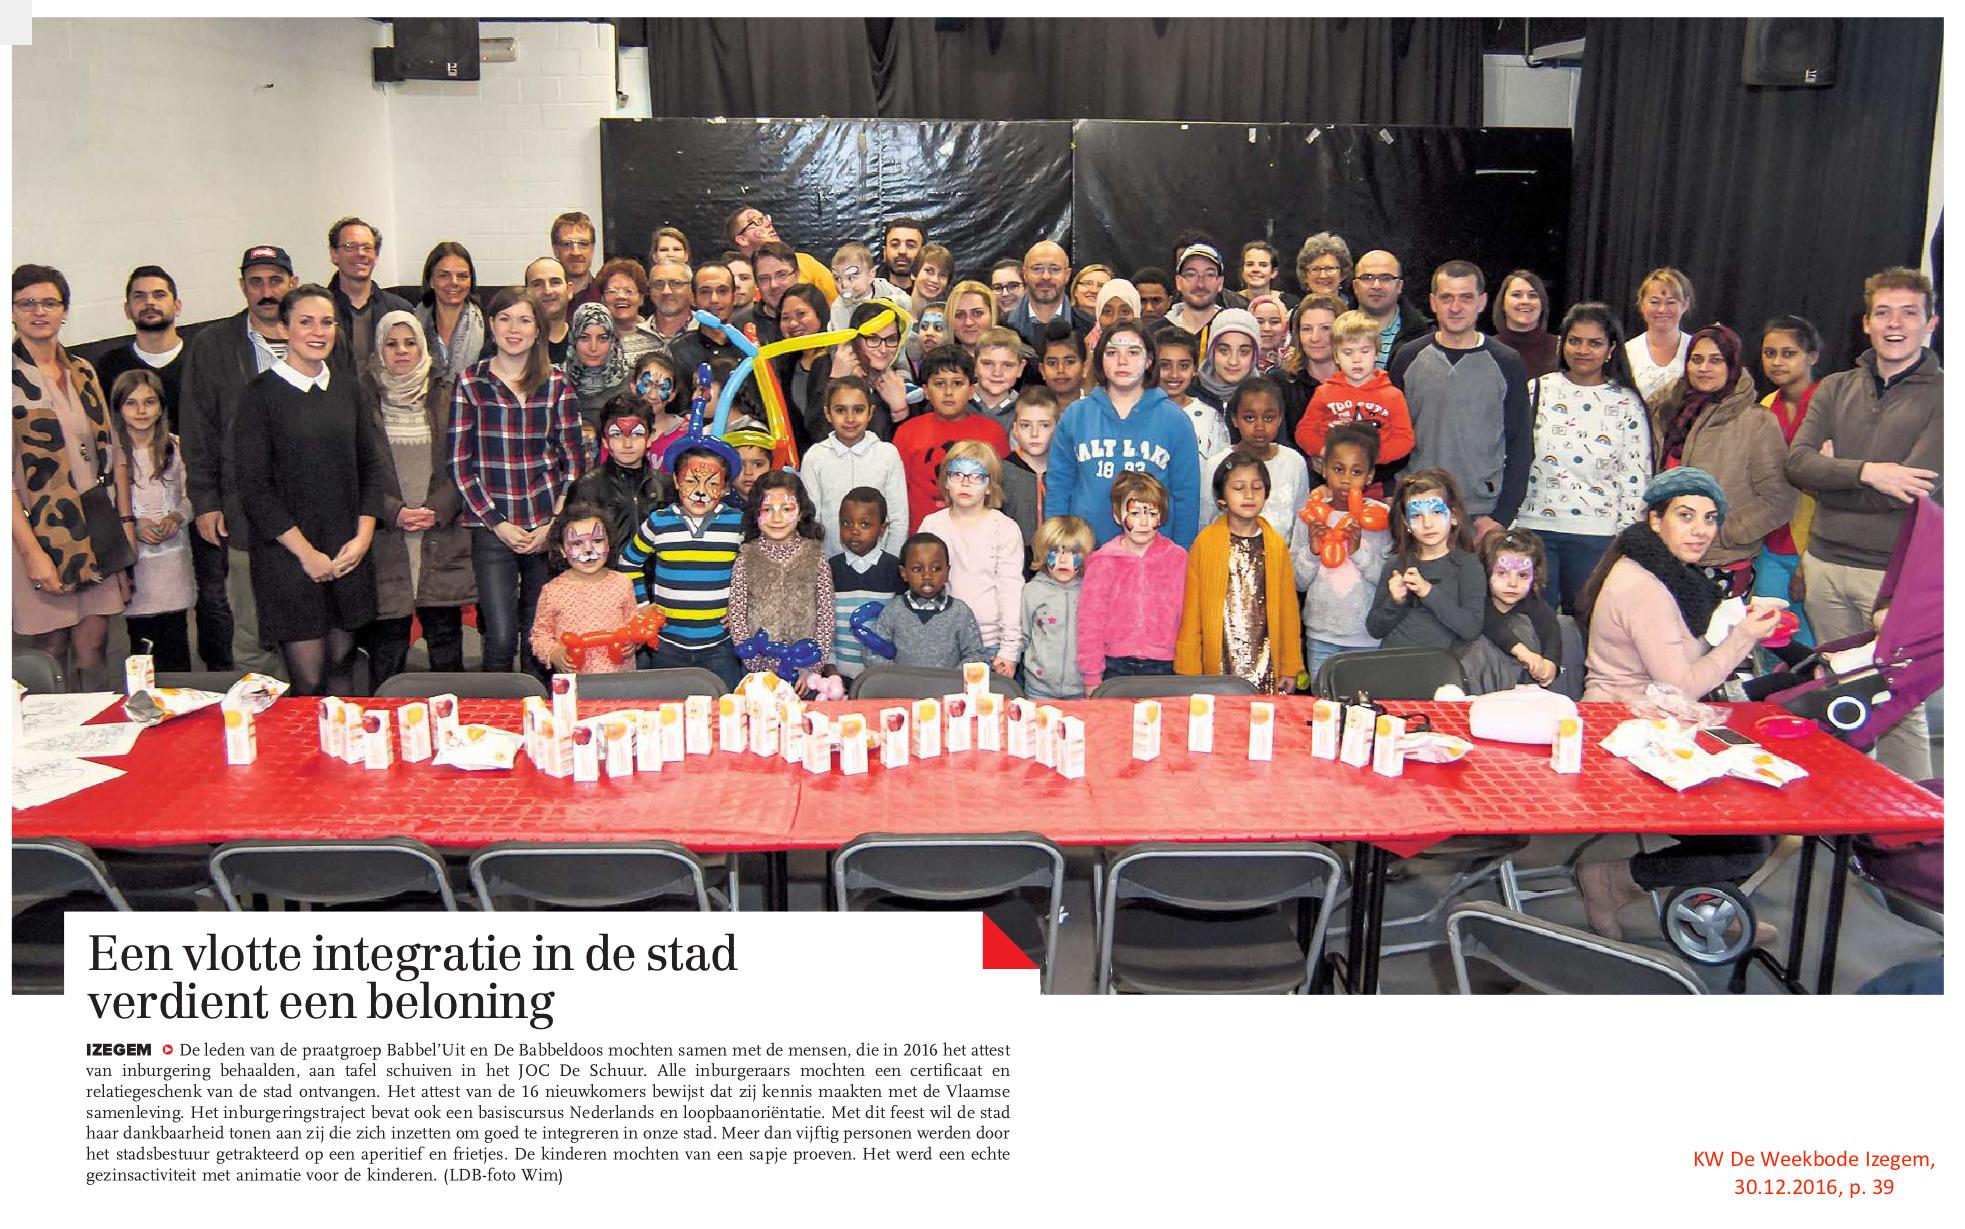 KW De Weekbode Izegem, 30.12.2016, p. 39